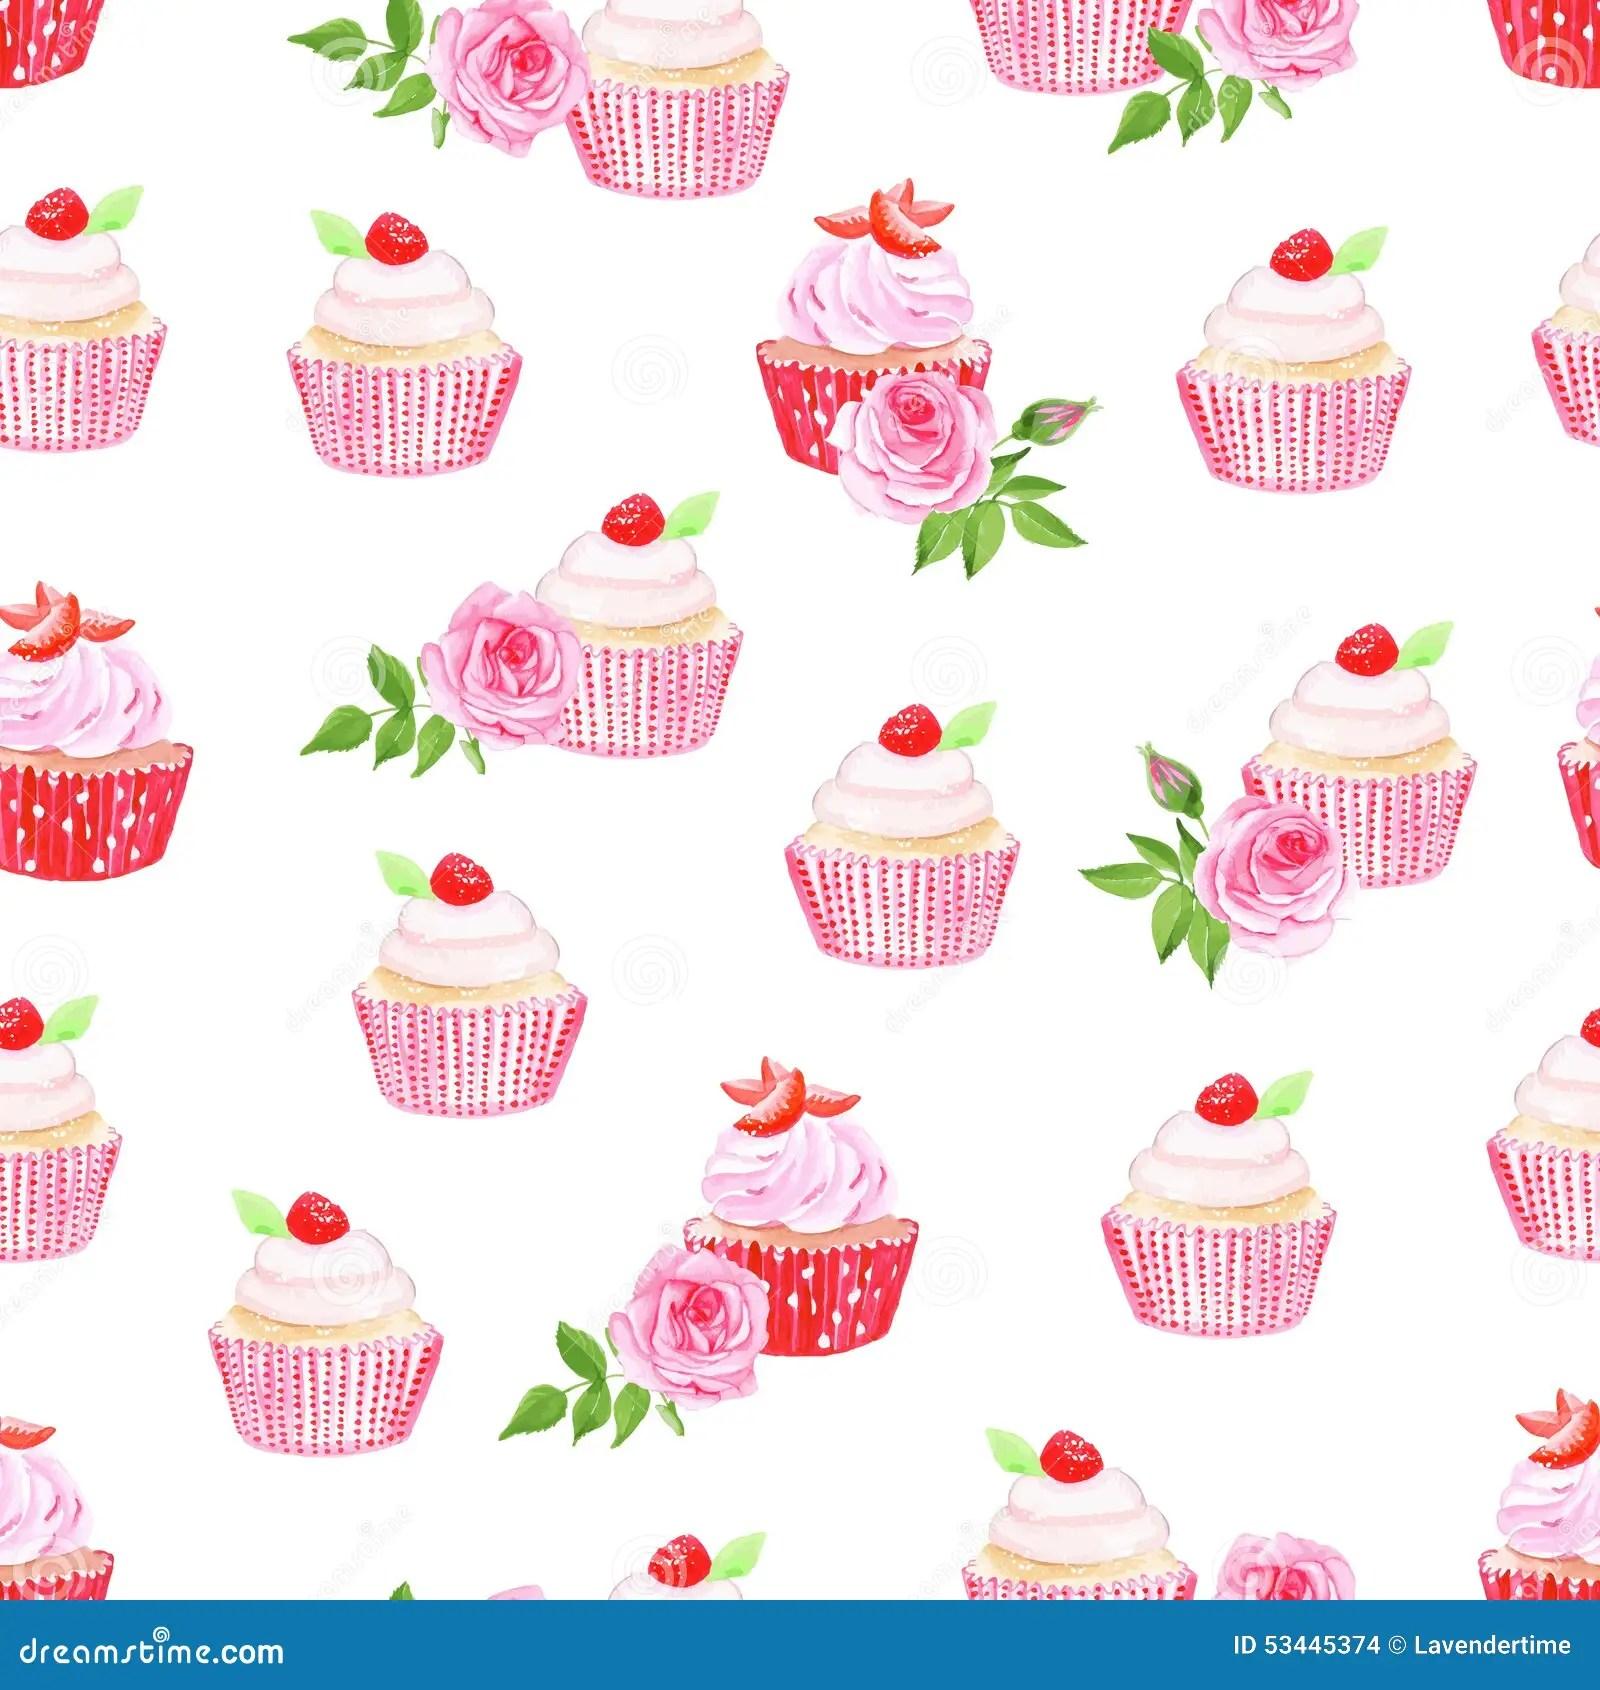 Bakery Wallpaper Hd Pink Cupcakes Vector Seamless Pattern Stock Vector Image